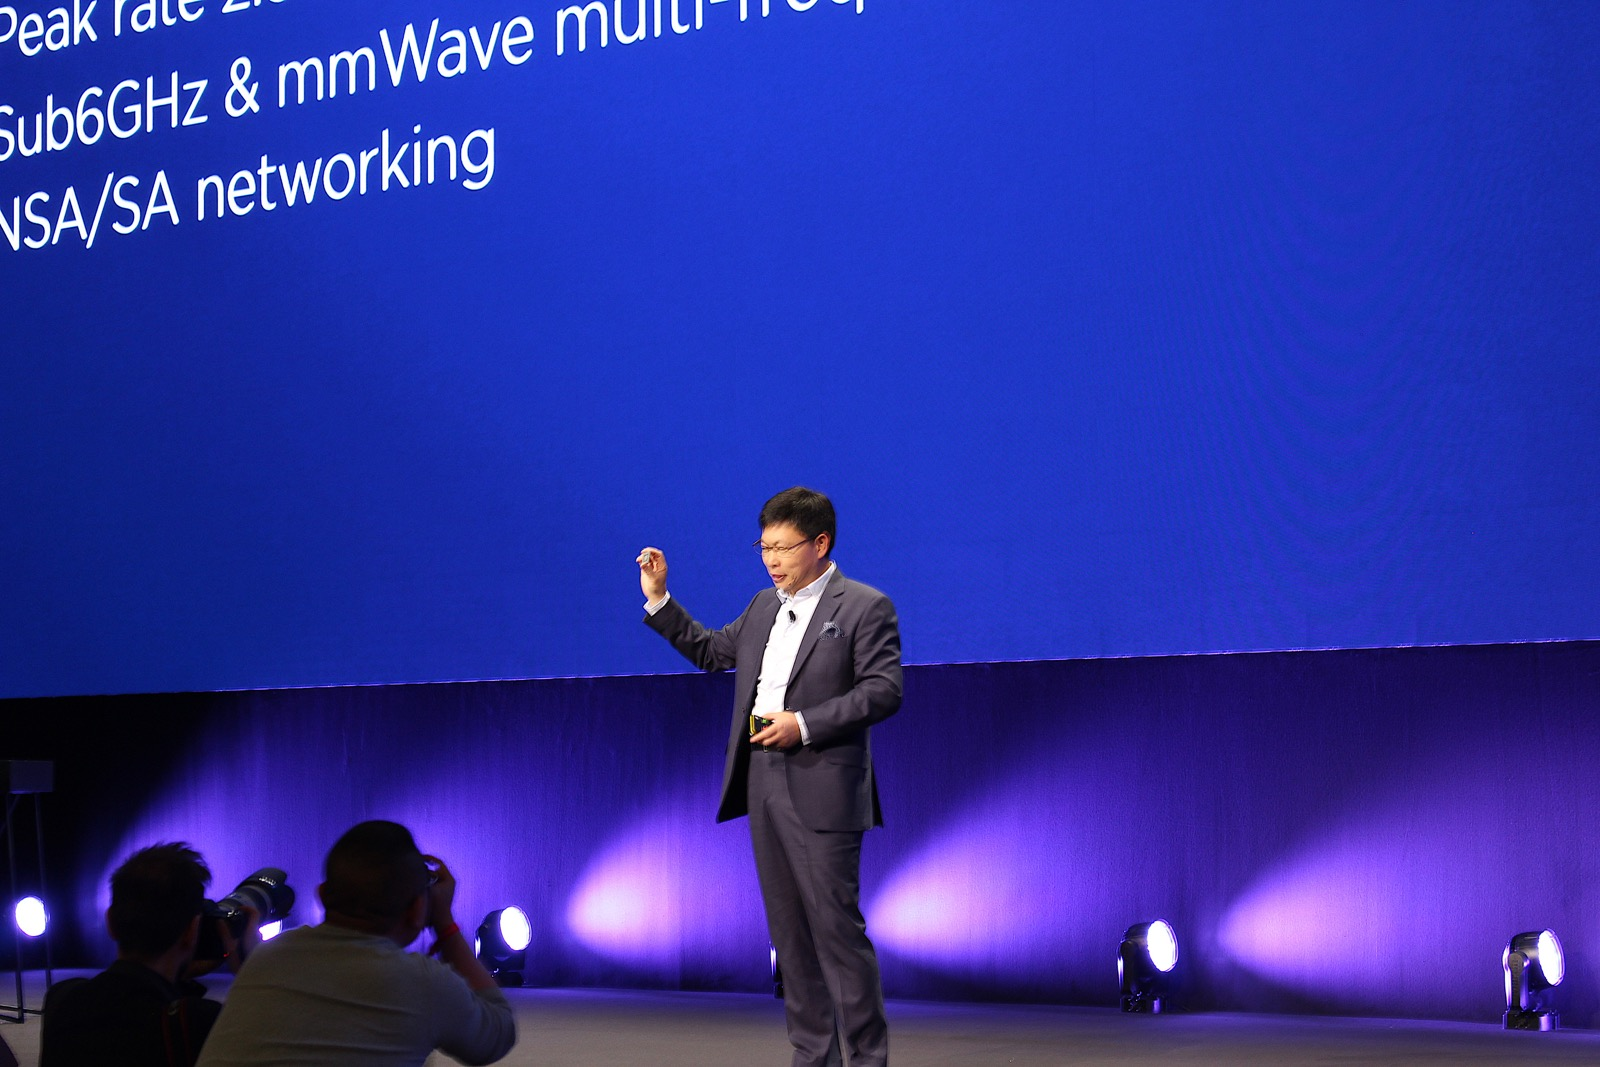 5G来了!华为发布首款3GPP标准5G商用芯片和终端